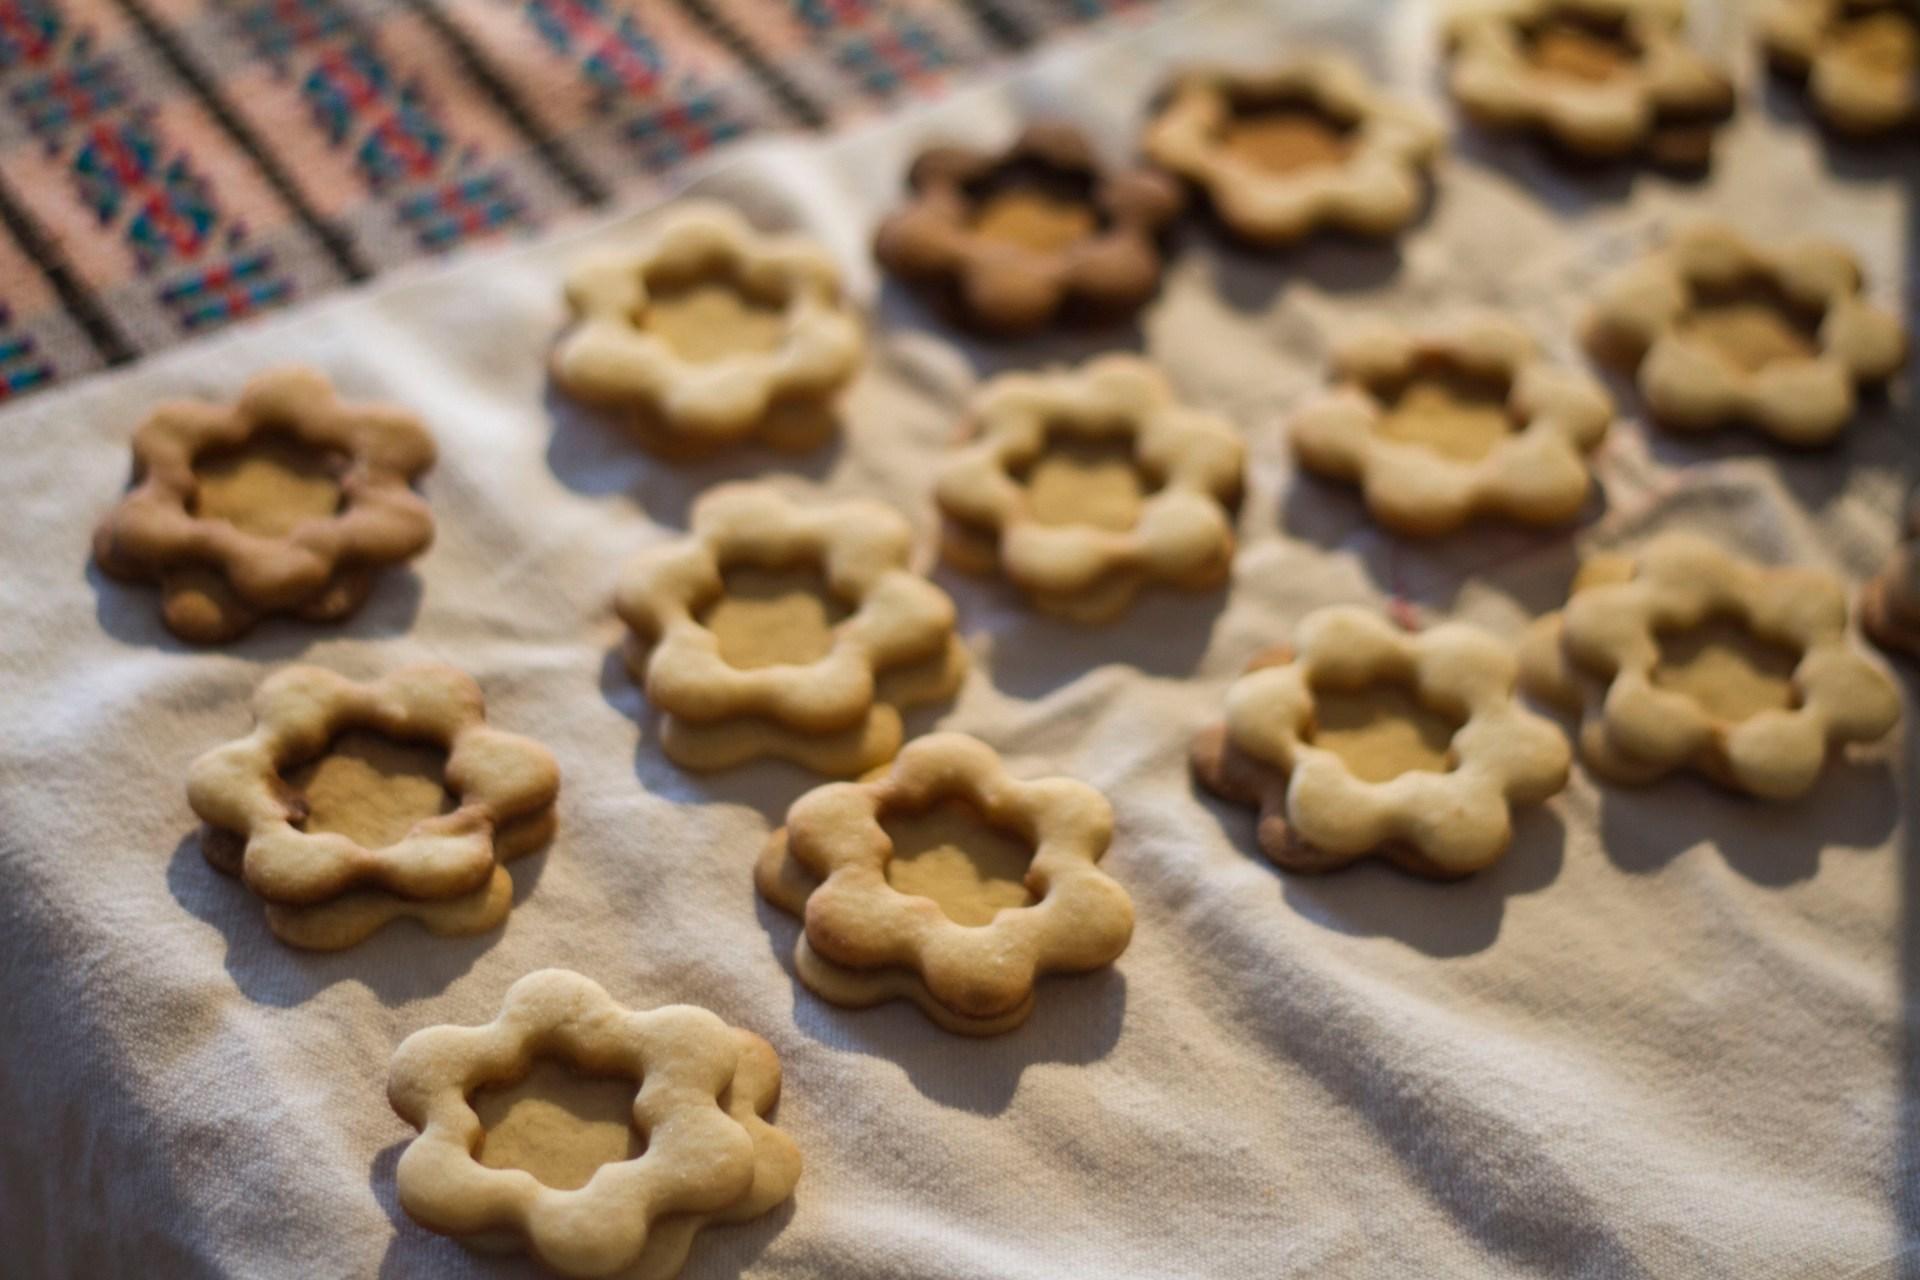 recette, recipe, pastry, sablés, fraise, cookies, gateaux, strawberry, patisserie, sweet, yummy